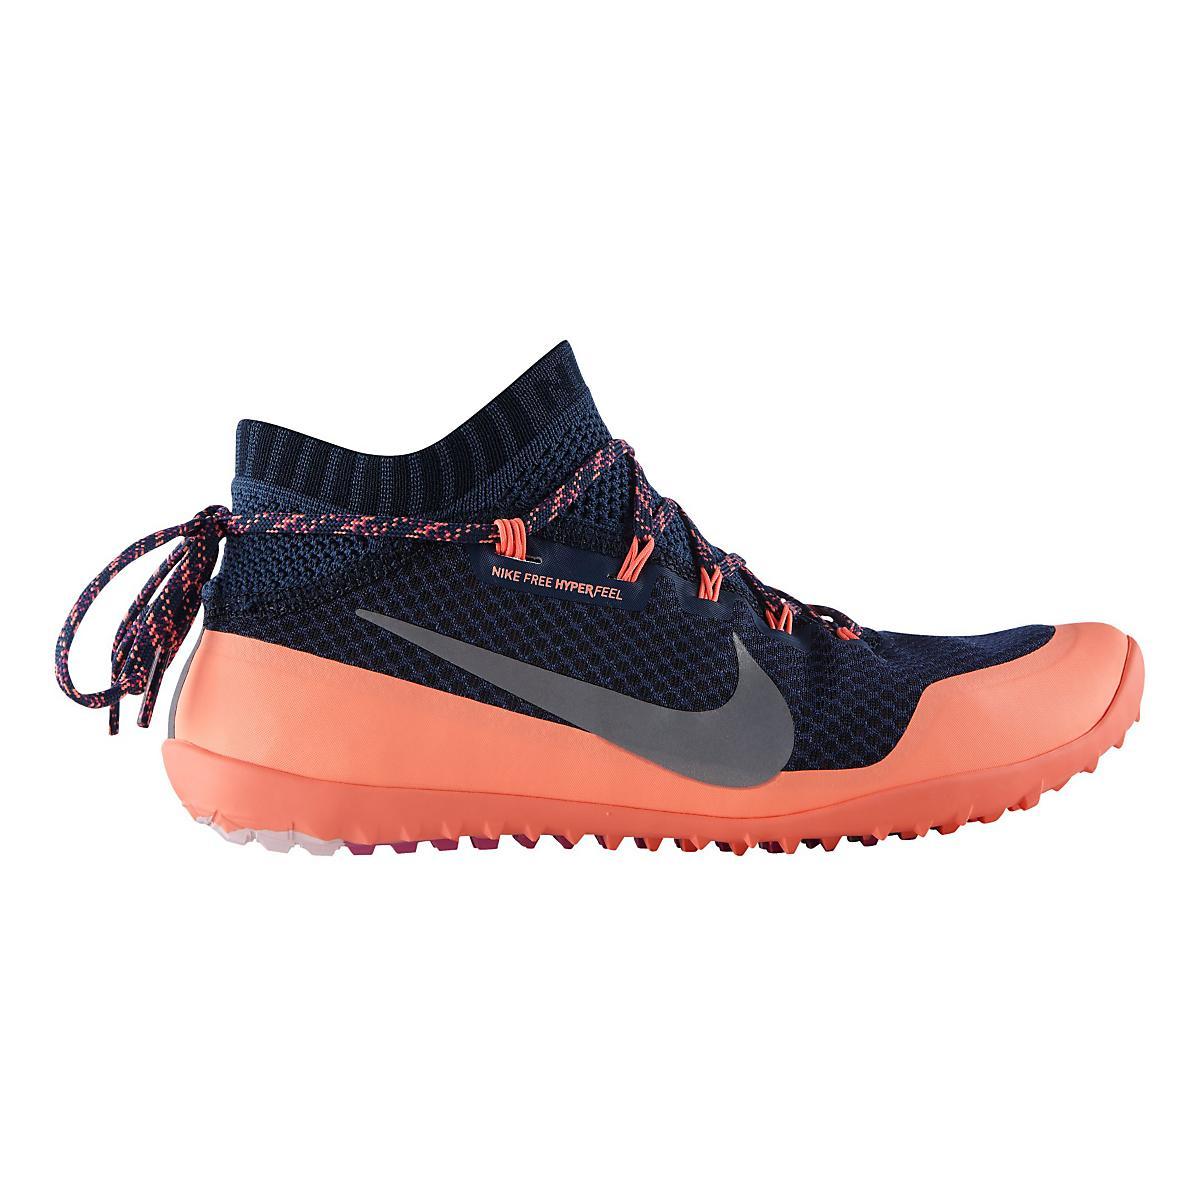 best website ab663 3ffd6 Womens Nike Free Hyperfeel Run Trail Trail Running Shoe at Road Runner  Sports